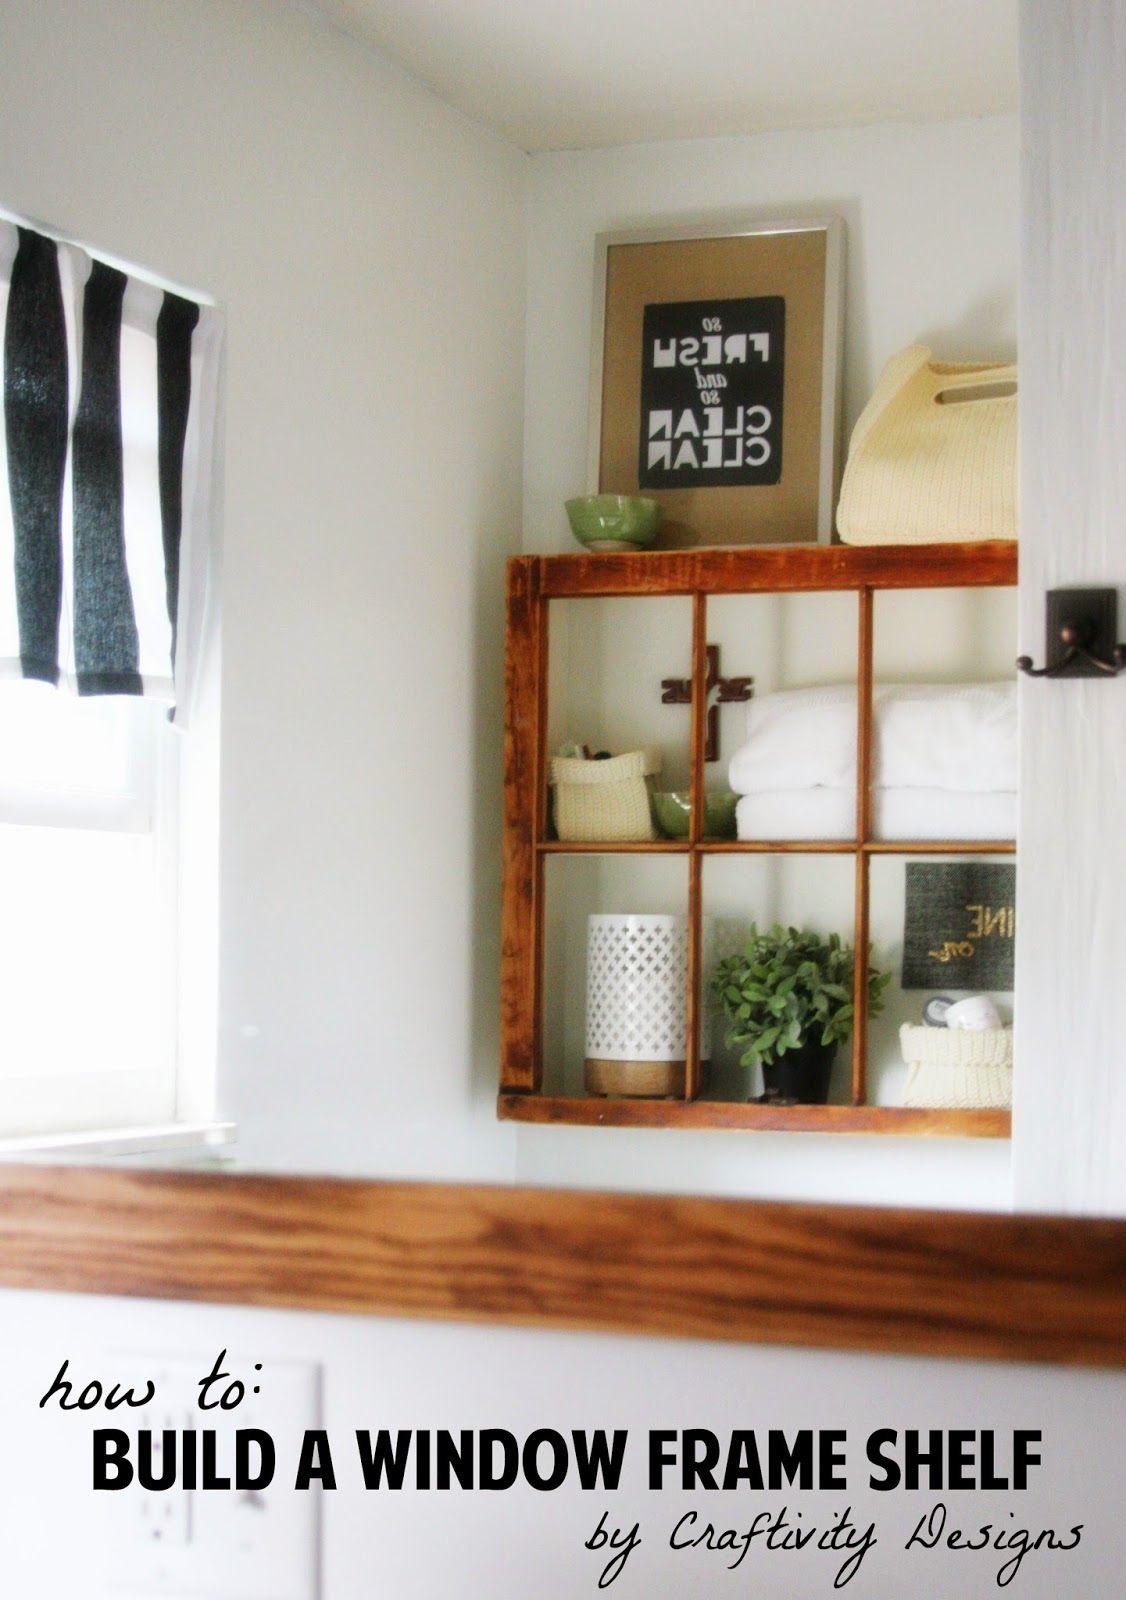 House wooden window design  old window into shelf  craftivigy designs  diy awesomeness